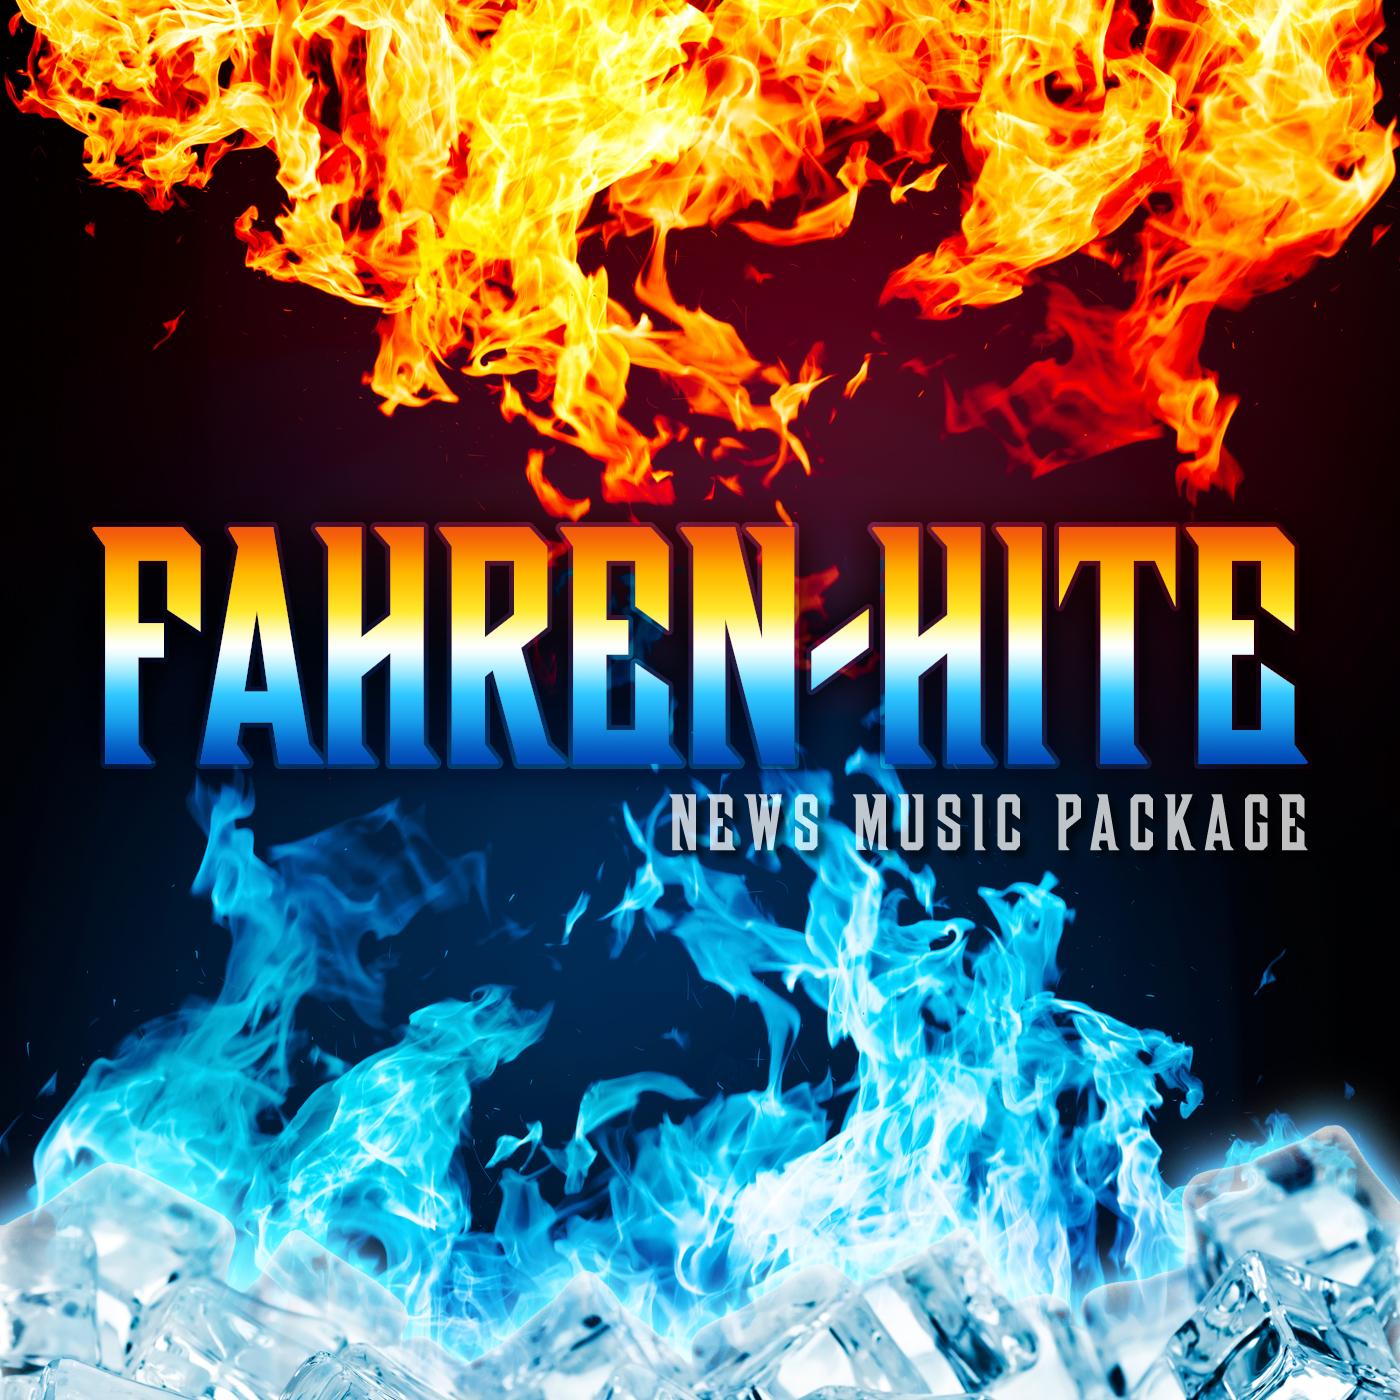 Fahren-Hite News Music Package